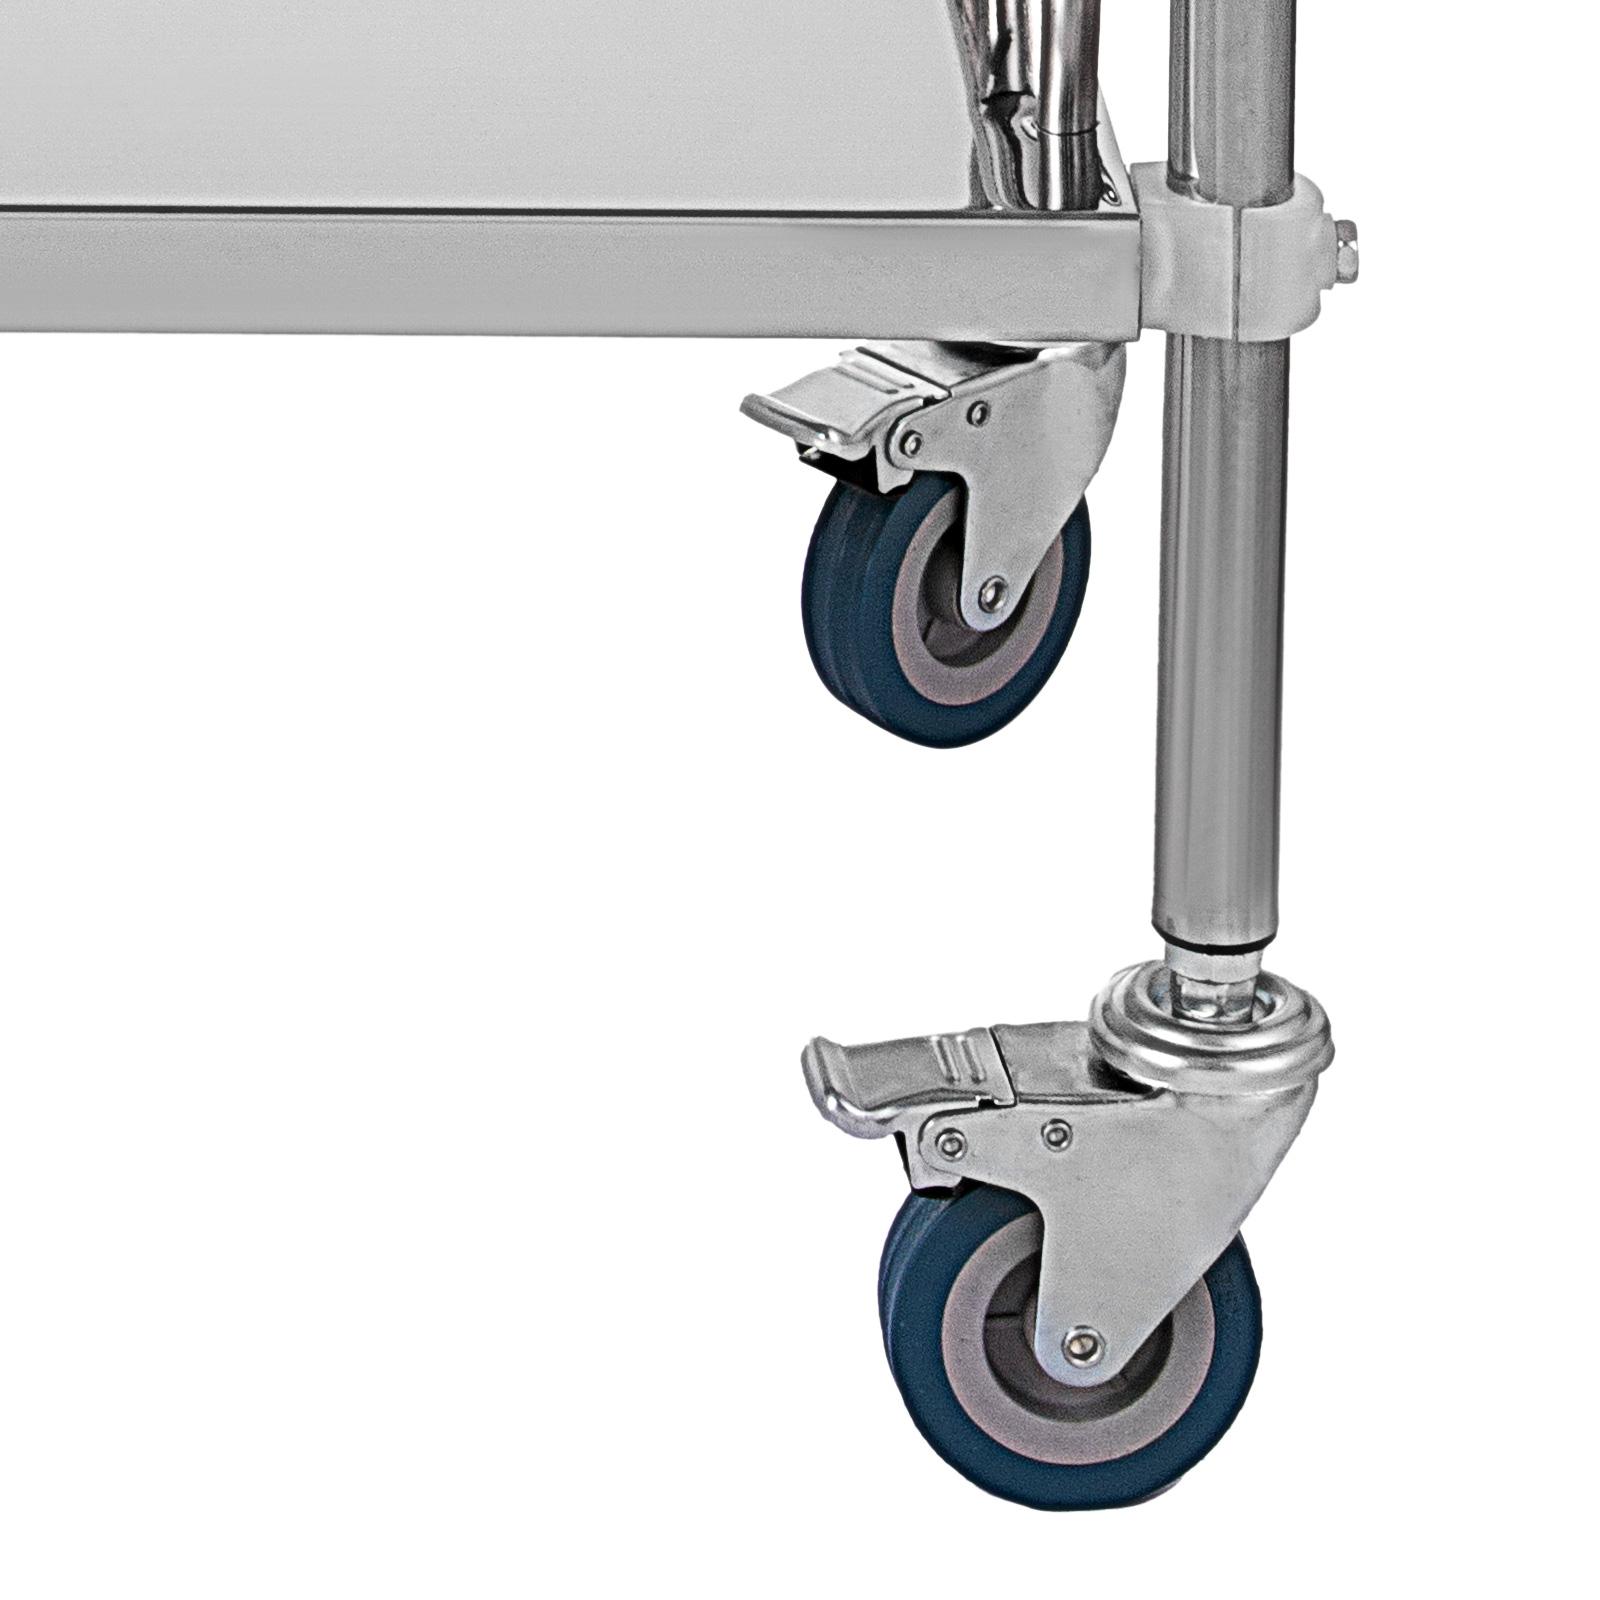 thumbnail 20 - Rolling Storage Cart Medical Salon Trolley Pedestal Rolling Cart Stainless Steel